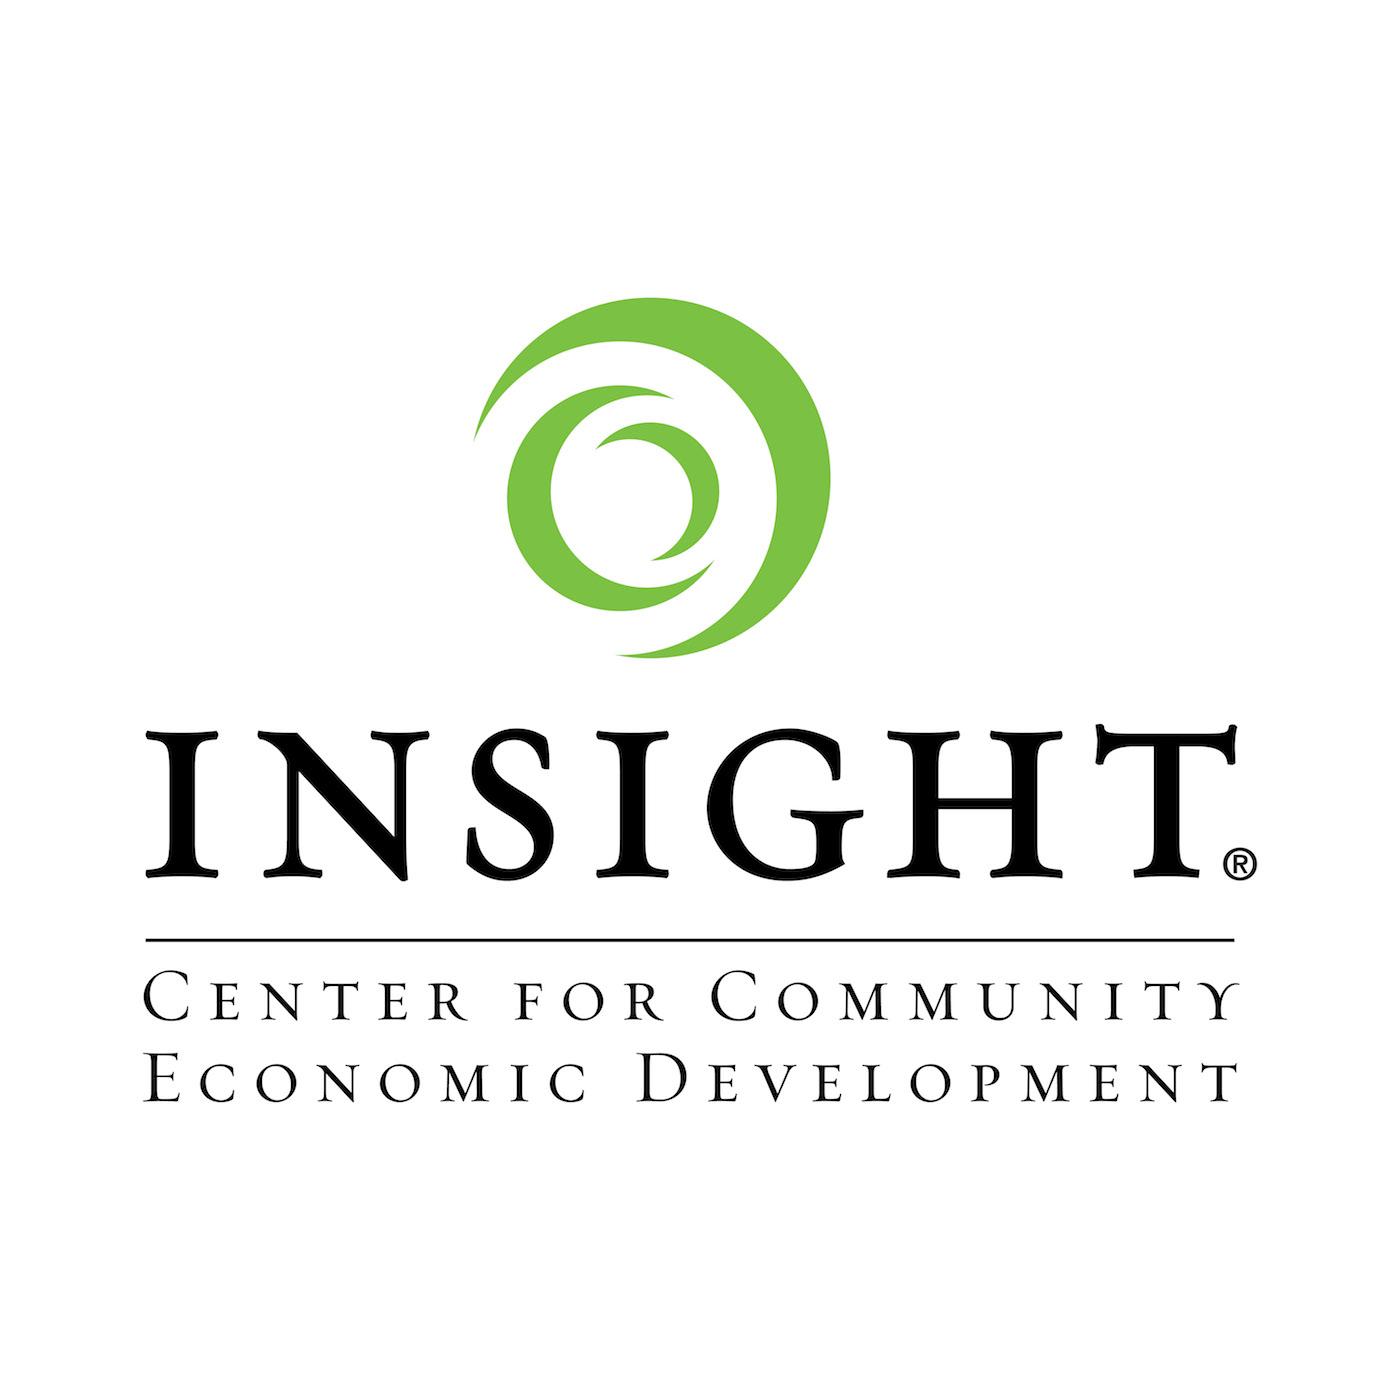 Insight Center for Community Economic Development logo